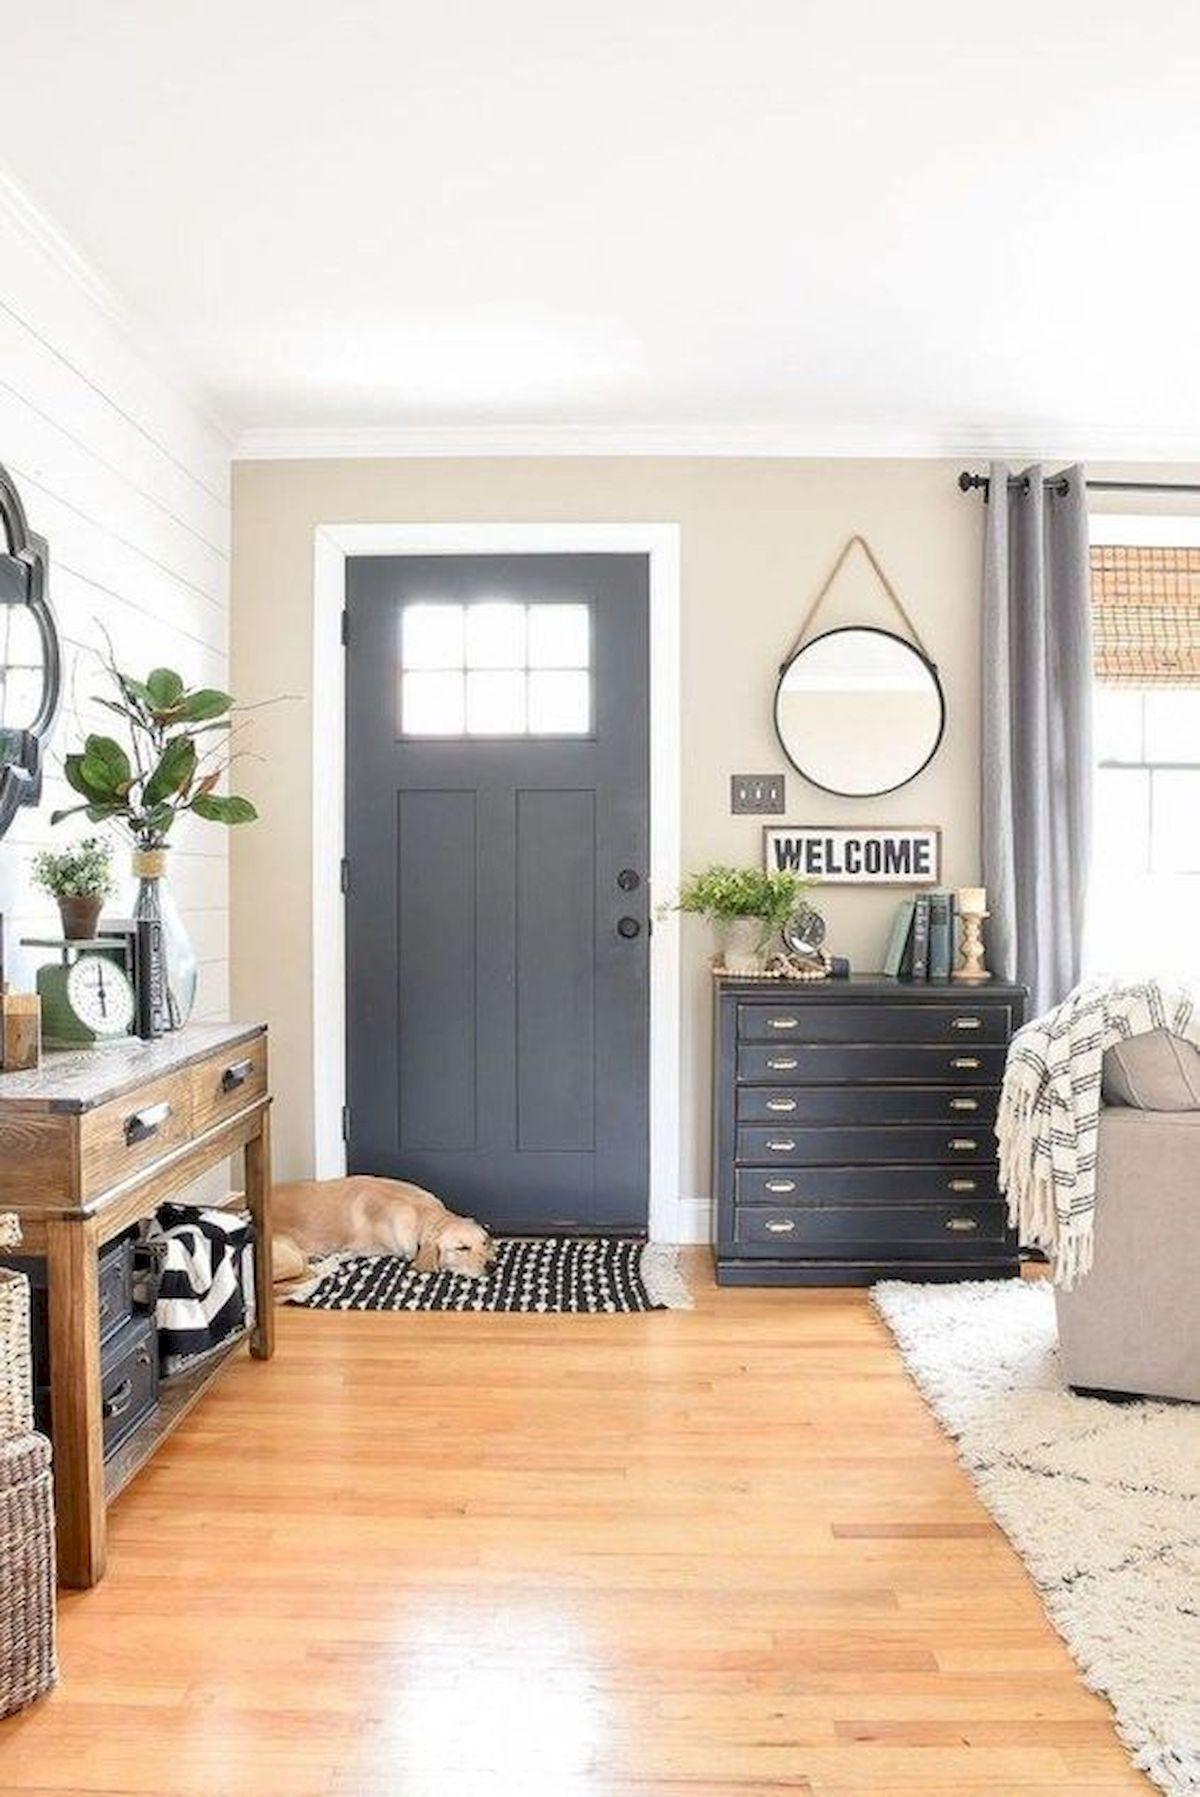 70 Best Modern Farmhouse Front Door Entrance Design Ideas 31 Home Decor Farm House Living Room Country House Decor